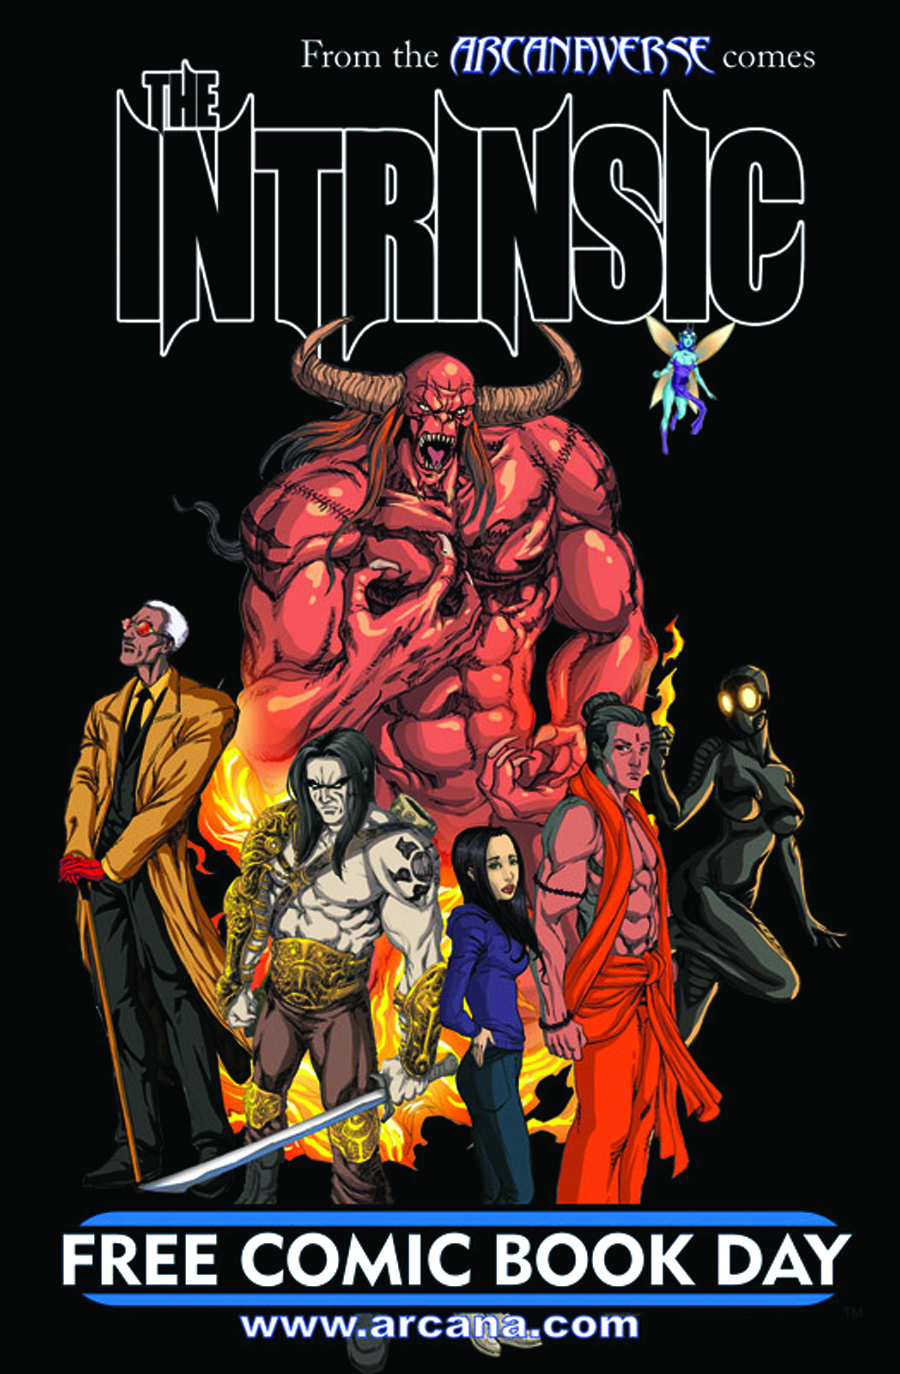 STK460321 Free Comic Book Day 2012: Reviews!